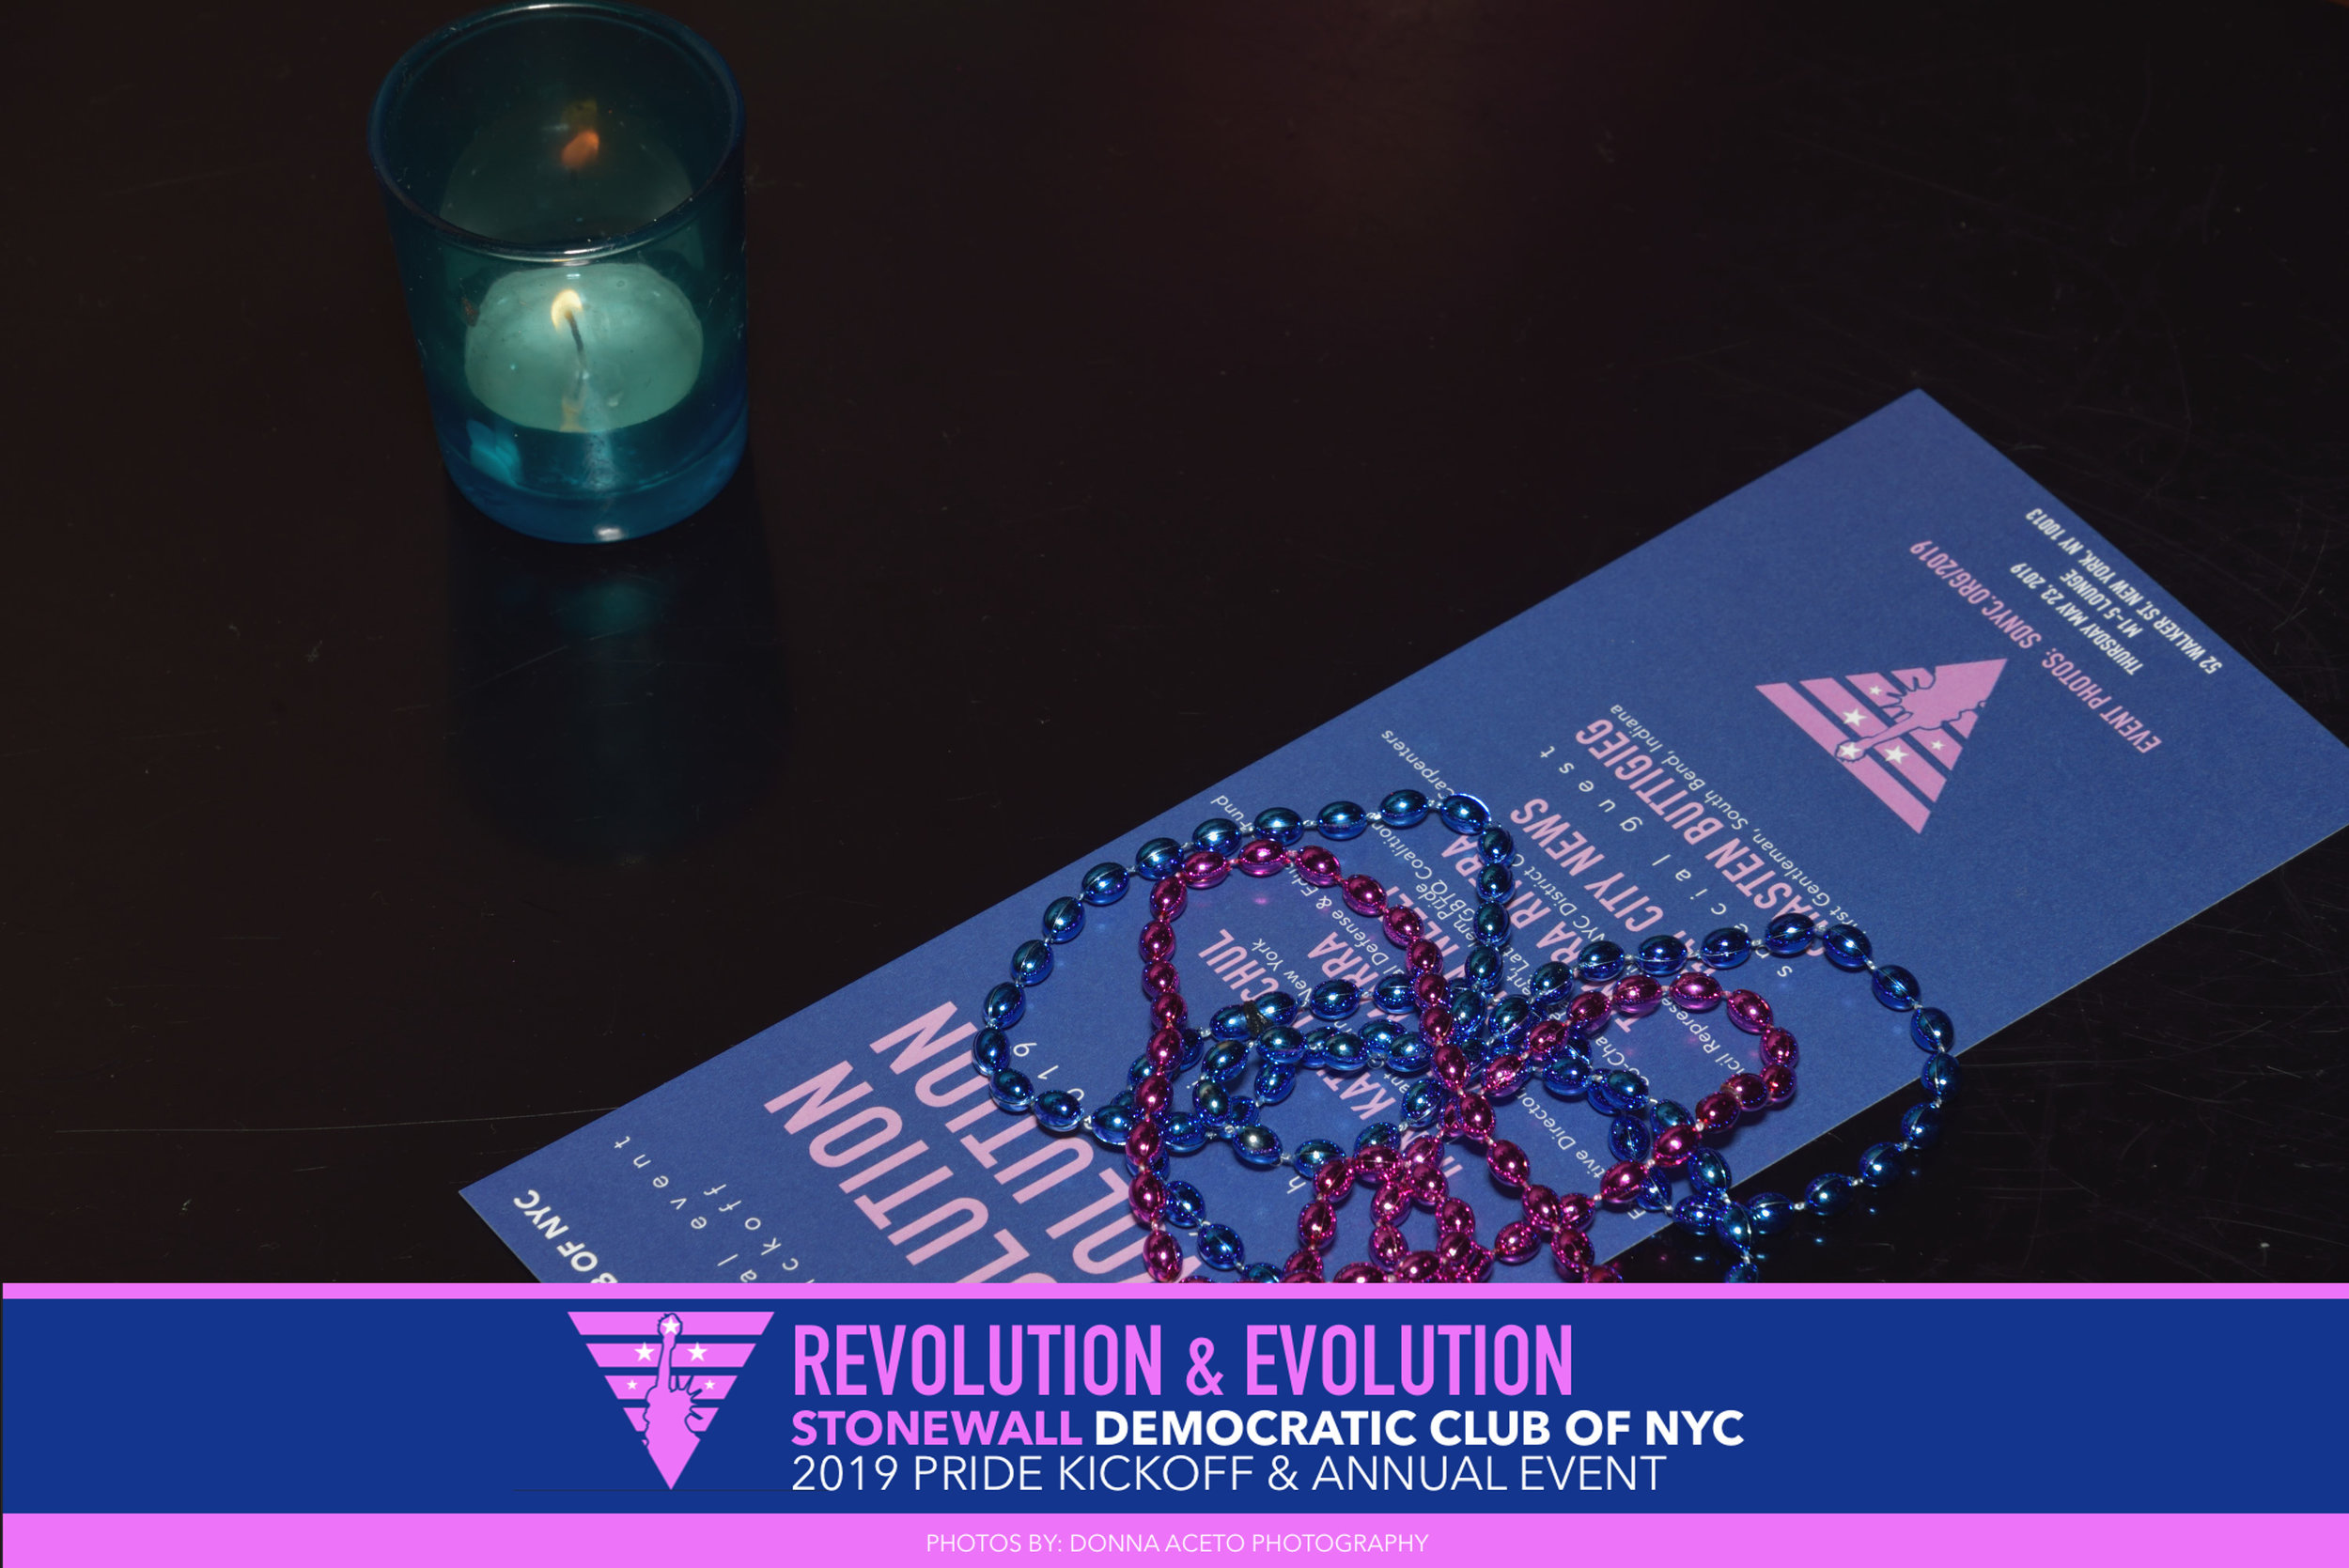 SDNYC 2019 ANNUAL EVENT2.jpg